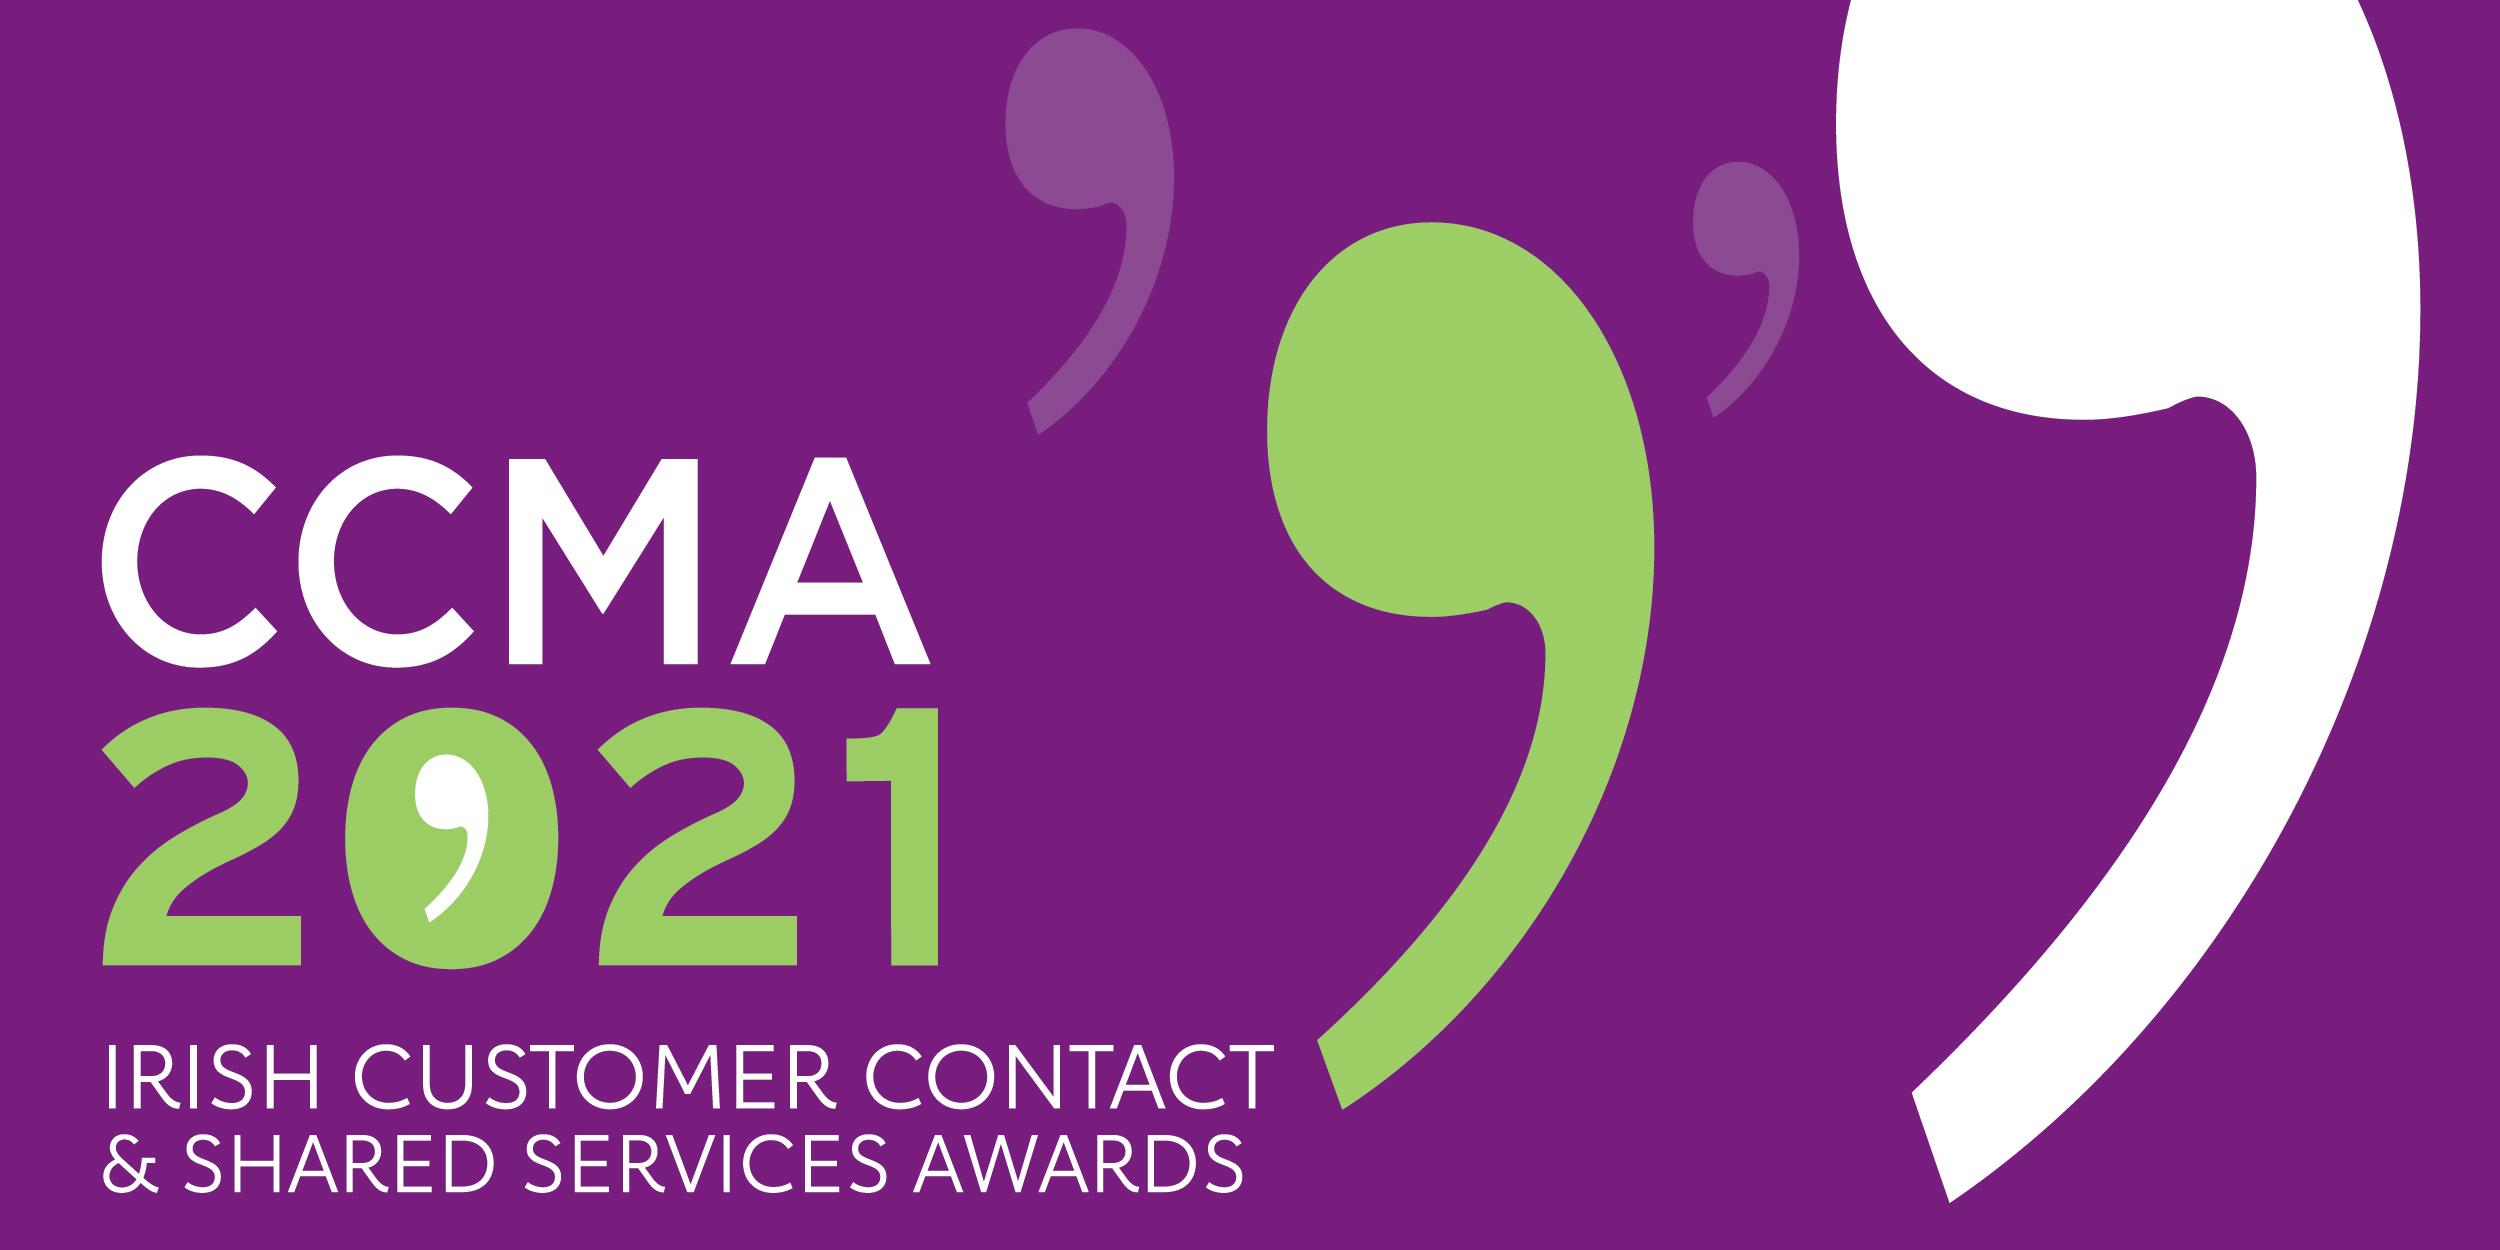 CCMA Irish Customer Contact & Shared Services Awards 2021 - Judges Call